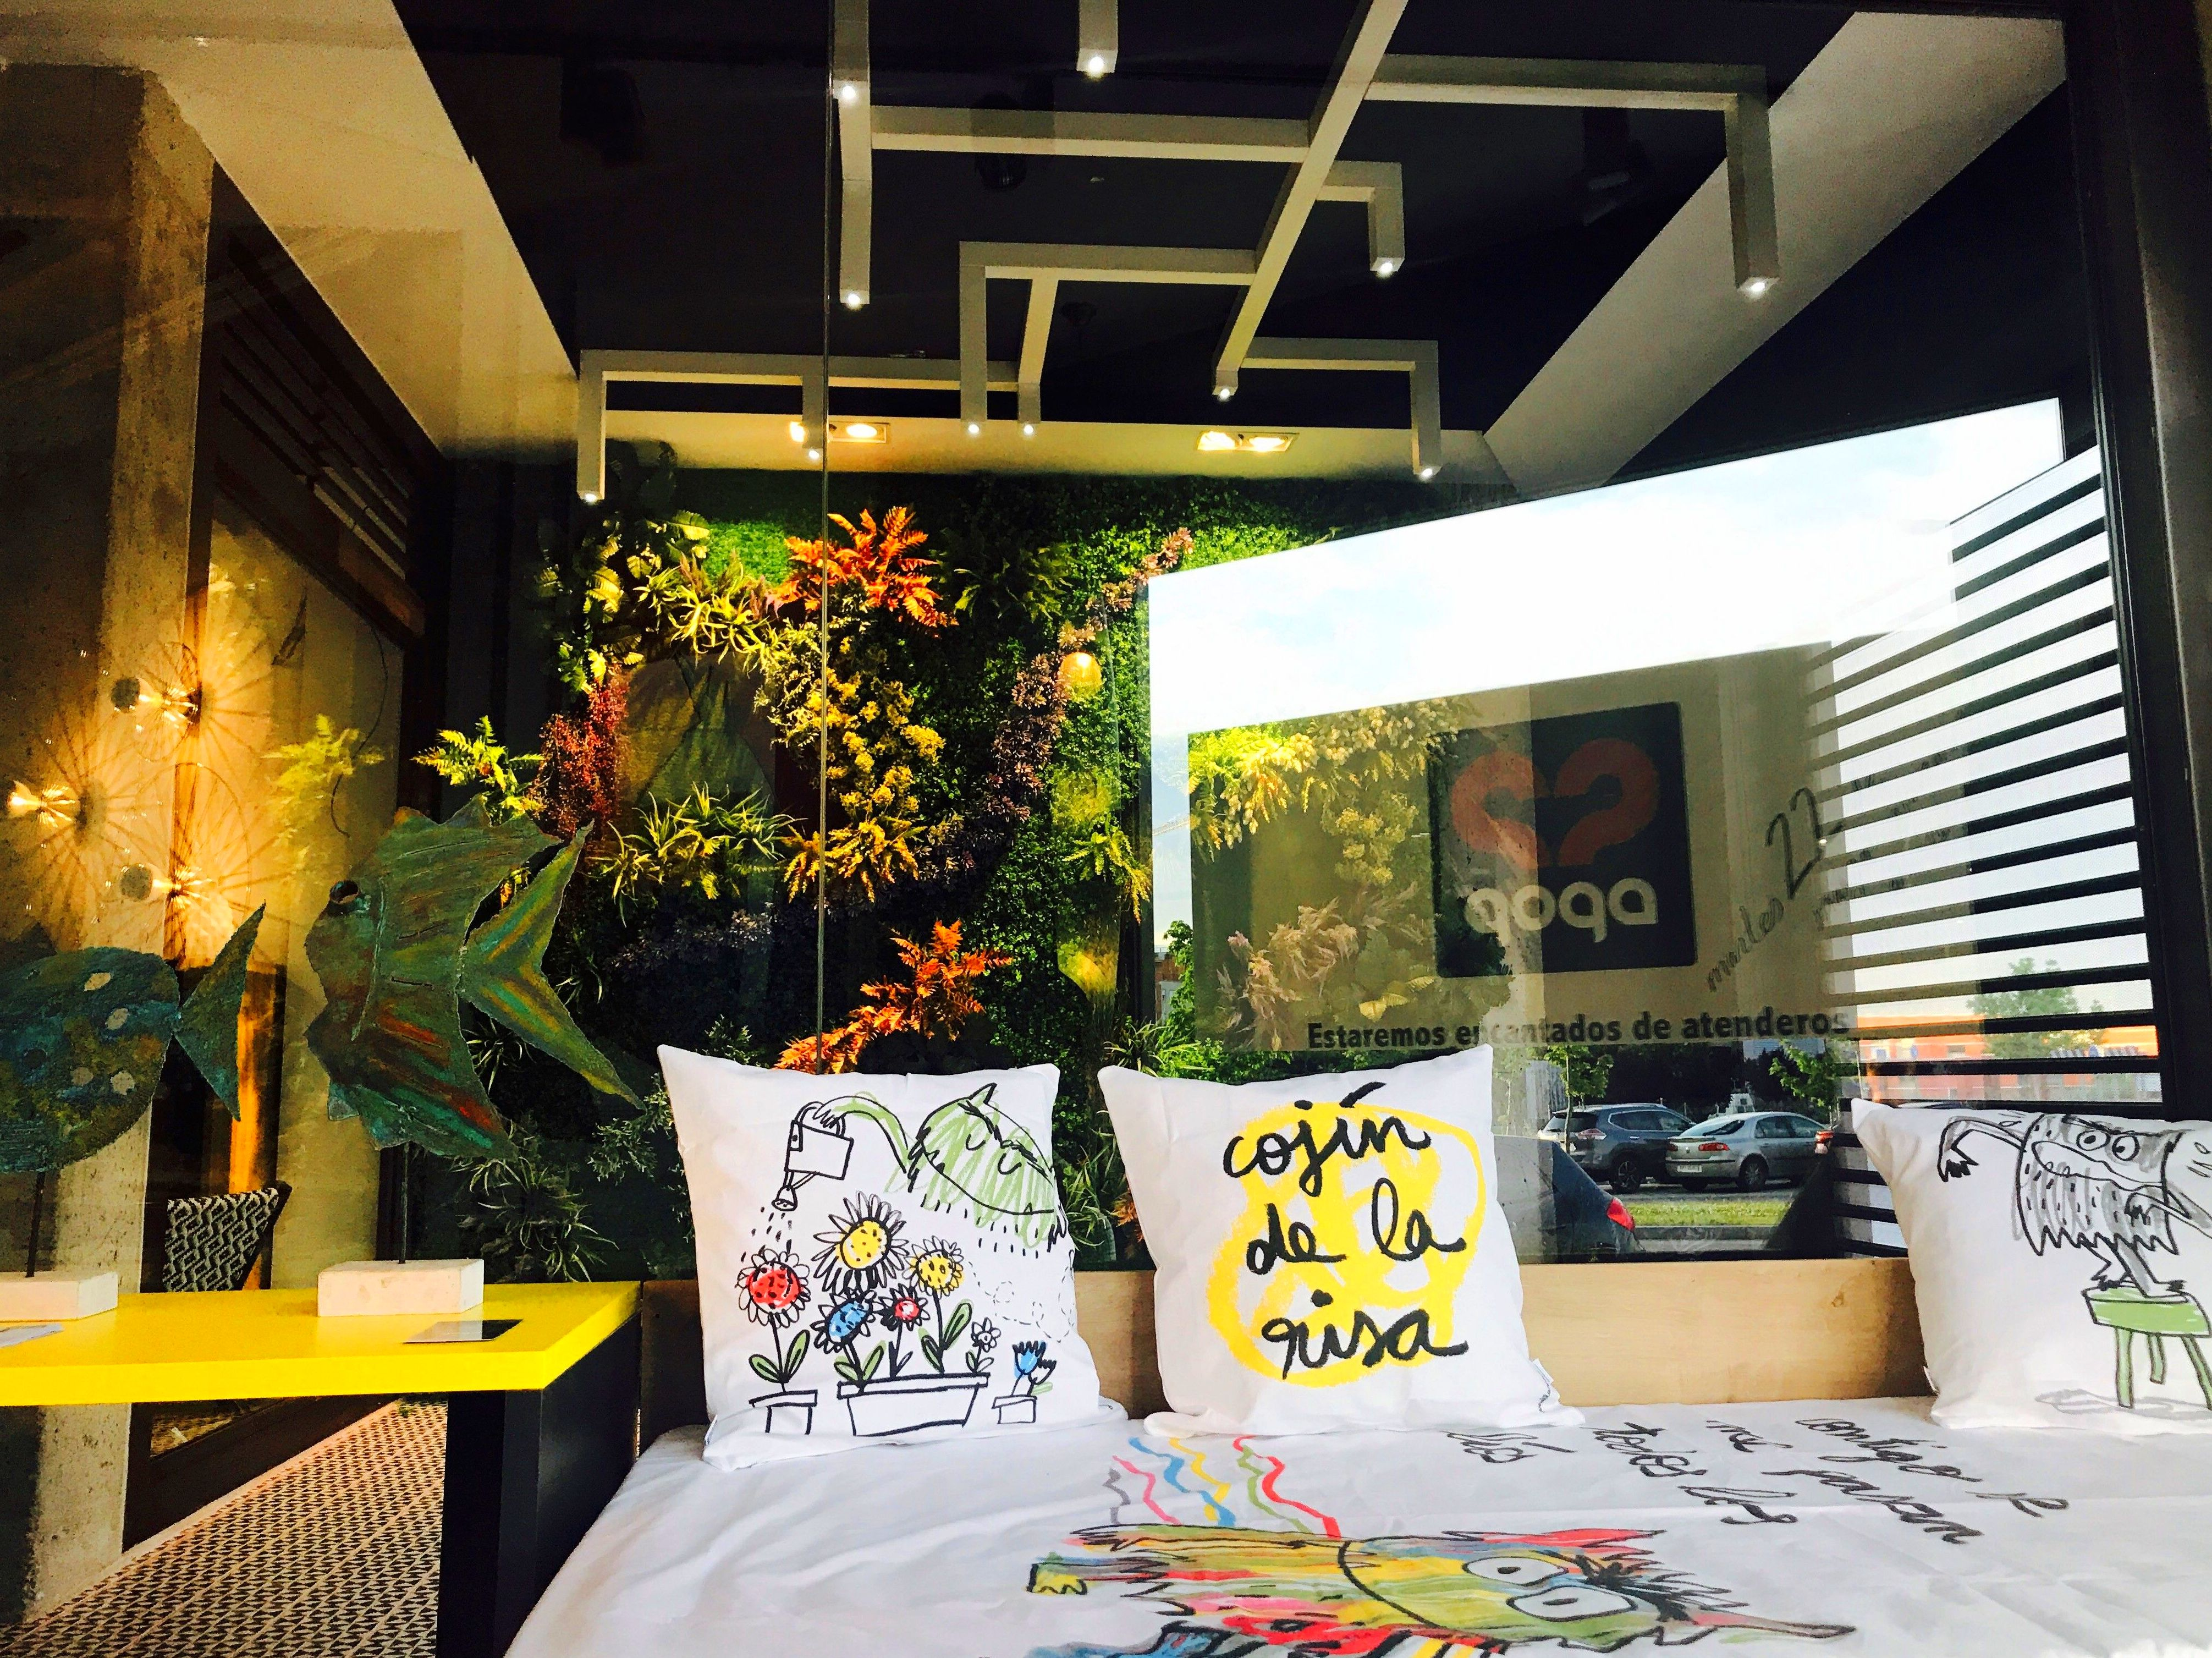 Foto 9 de Muebles en Getafe | Goga Muebles & Complementos